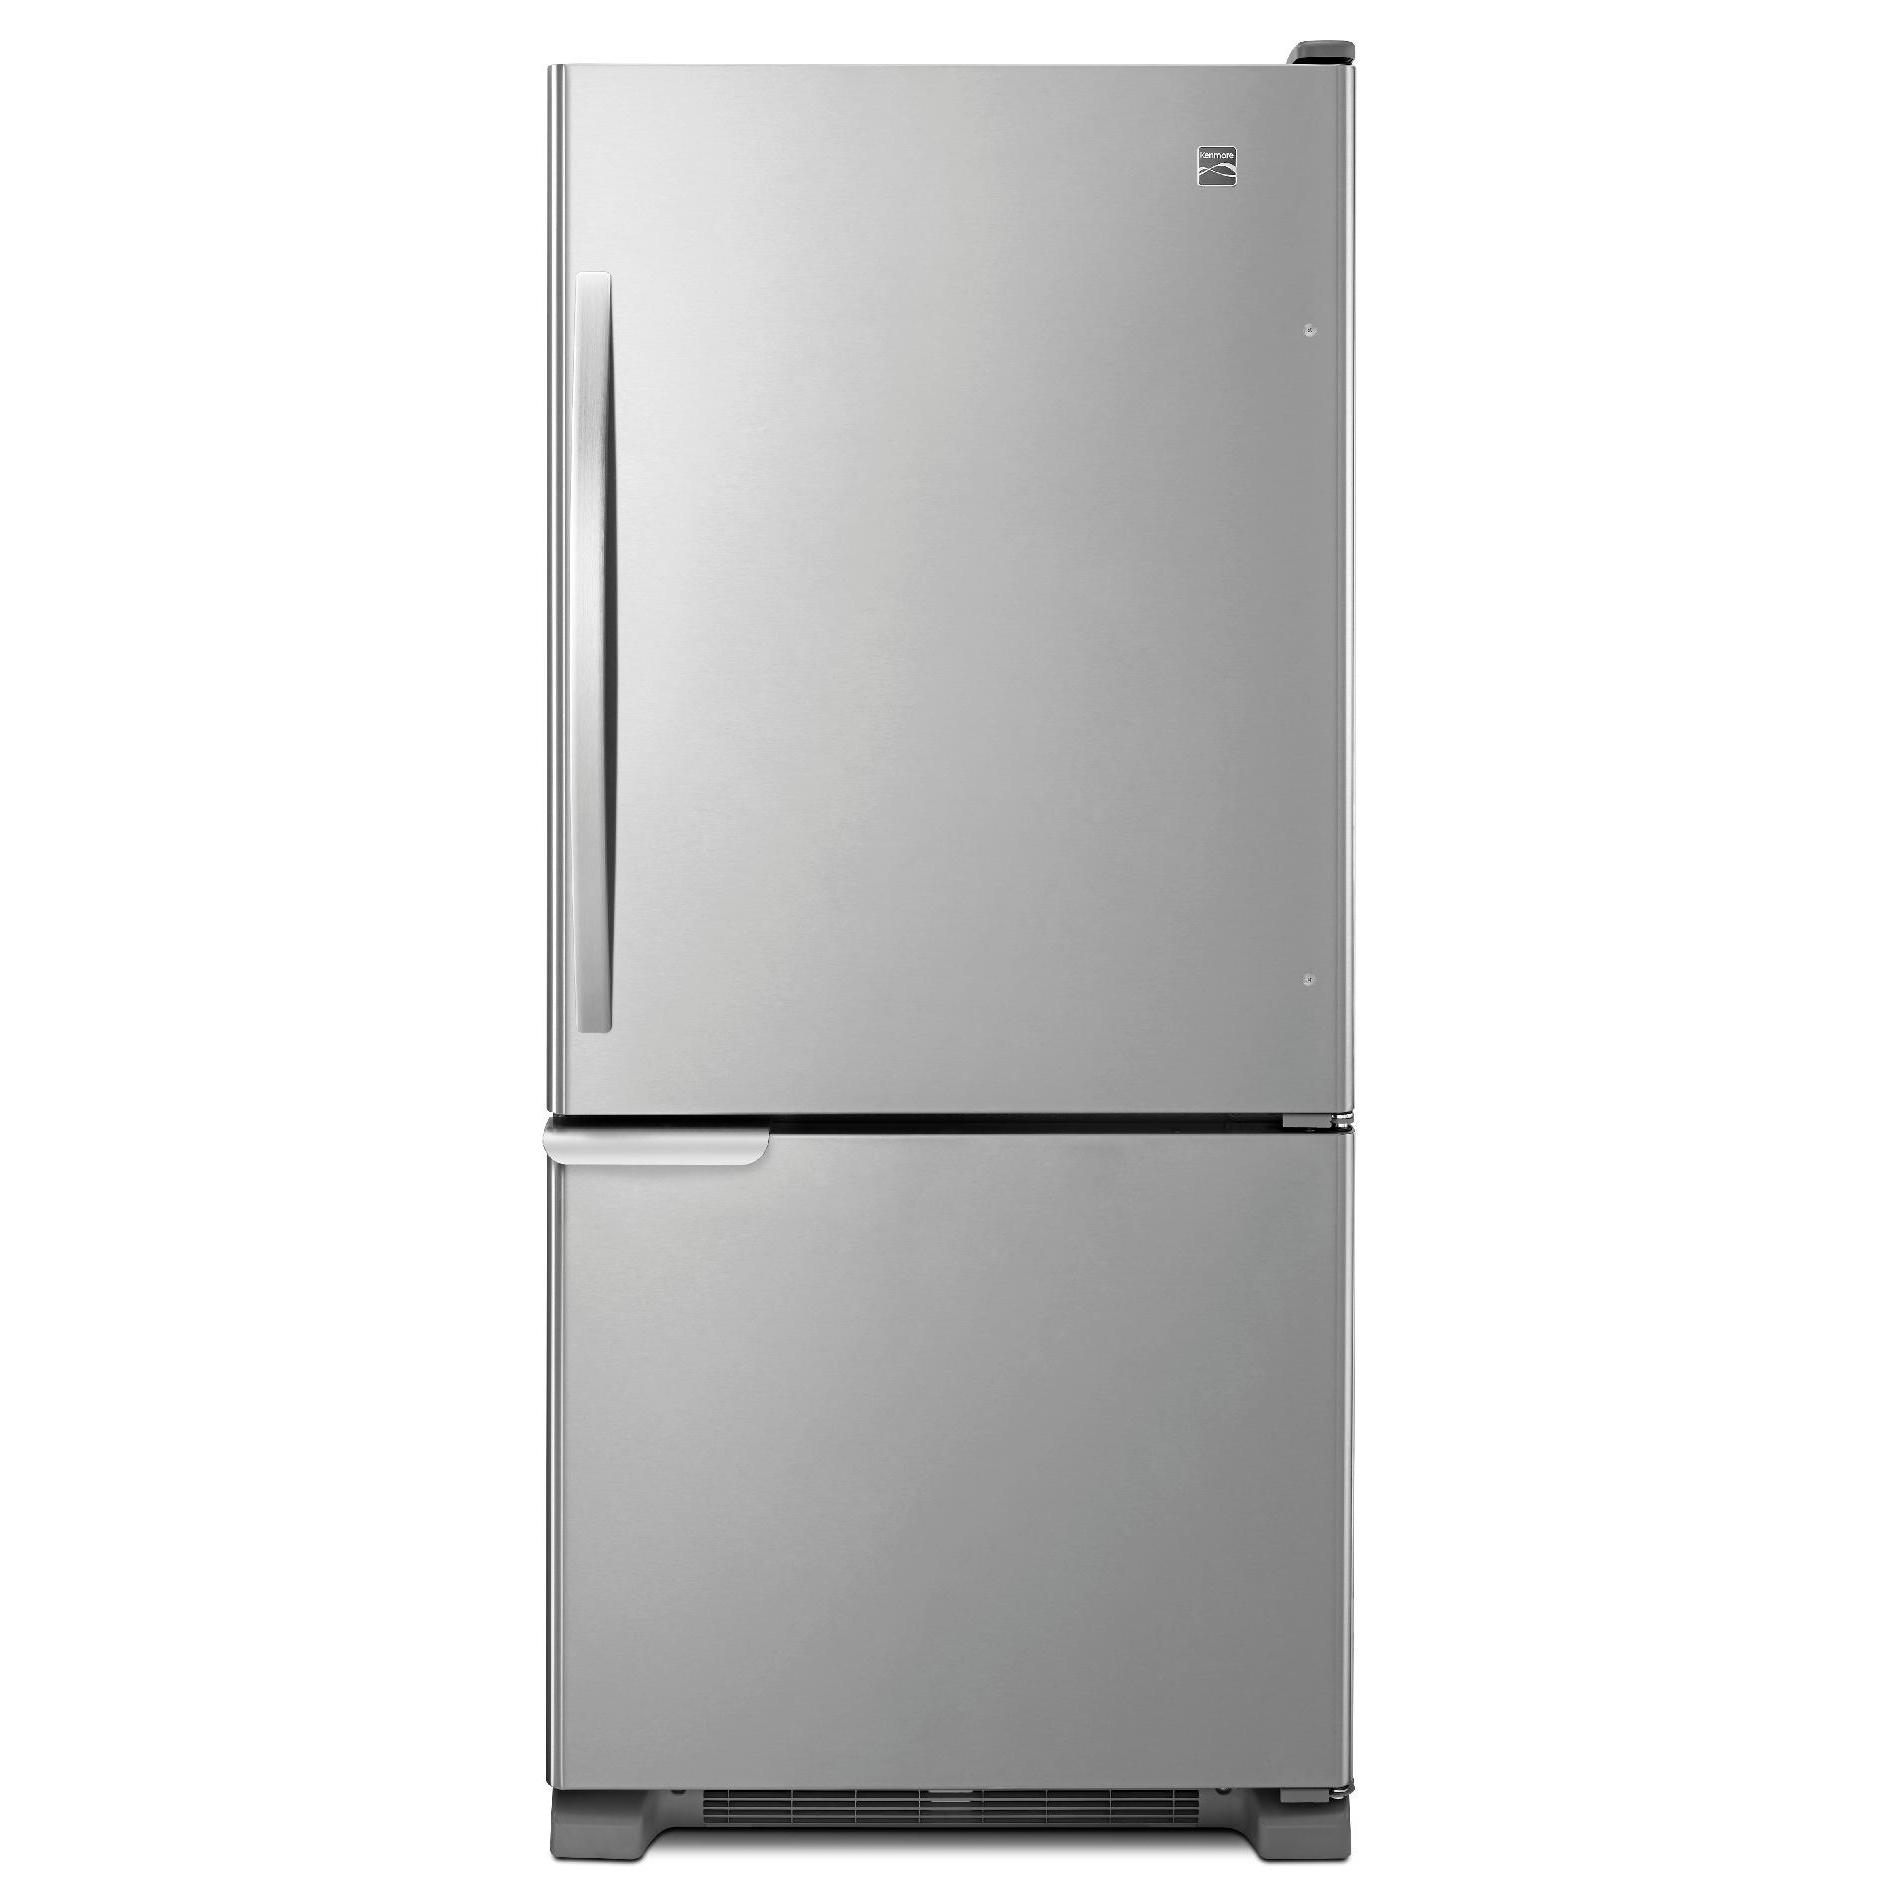 Kenmore 69313 19 cu. ft. Bottom-Freezer Refrigerator - Stainless ...